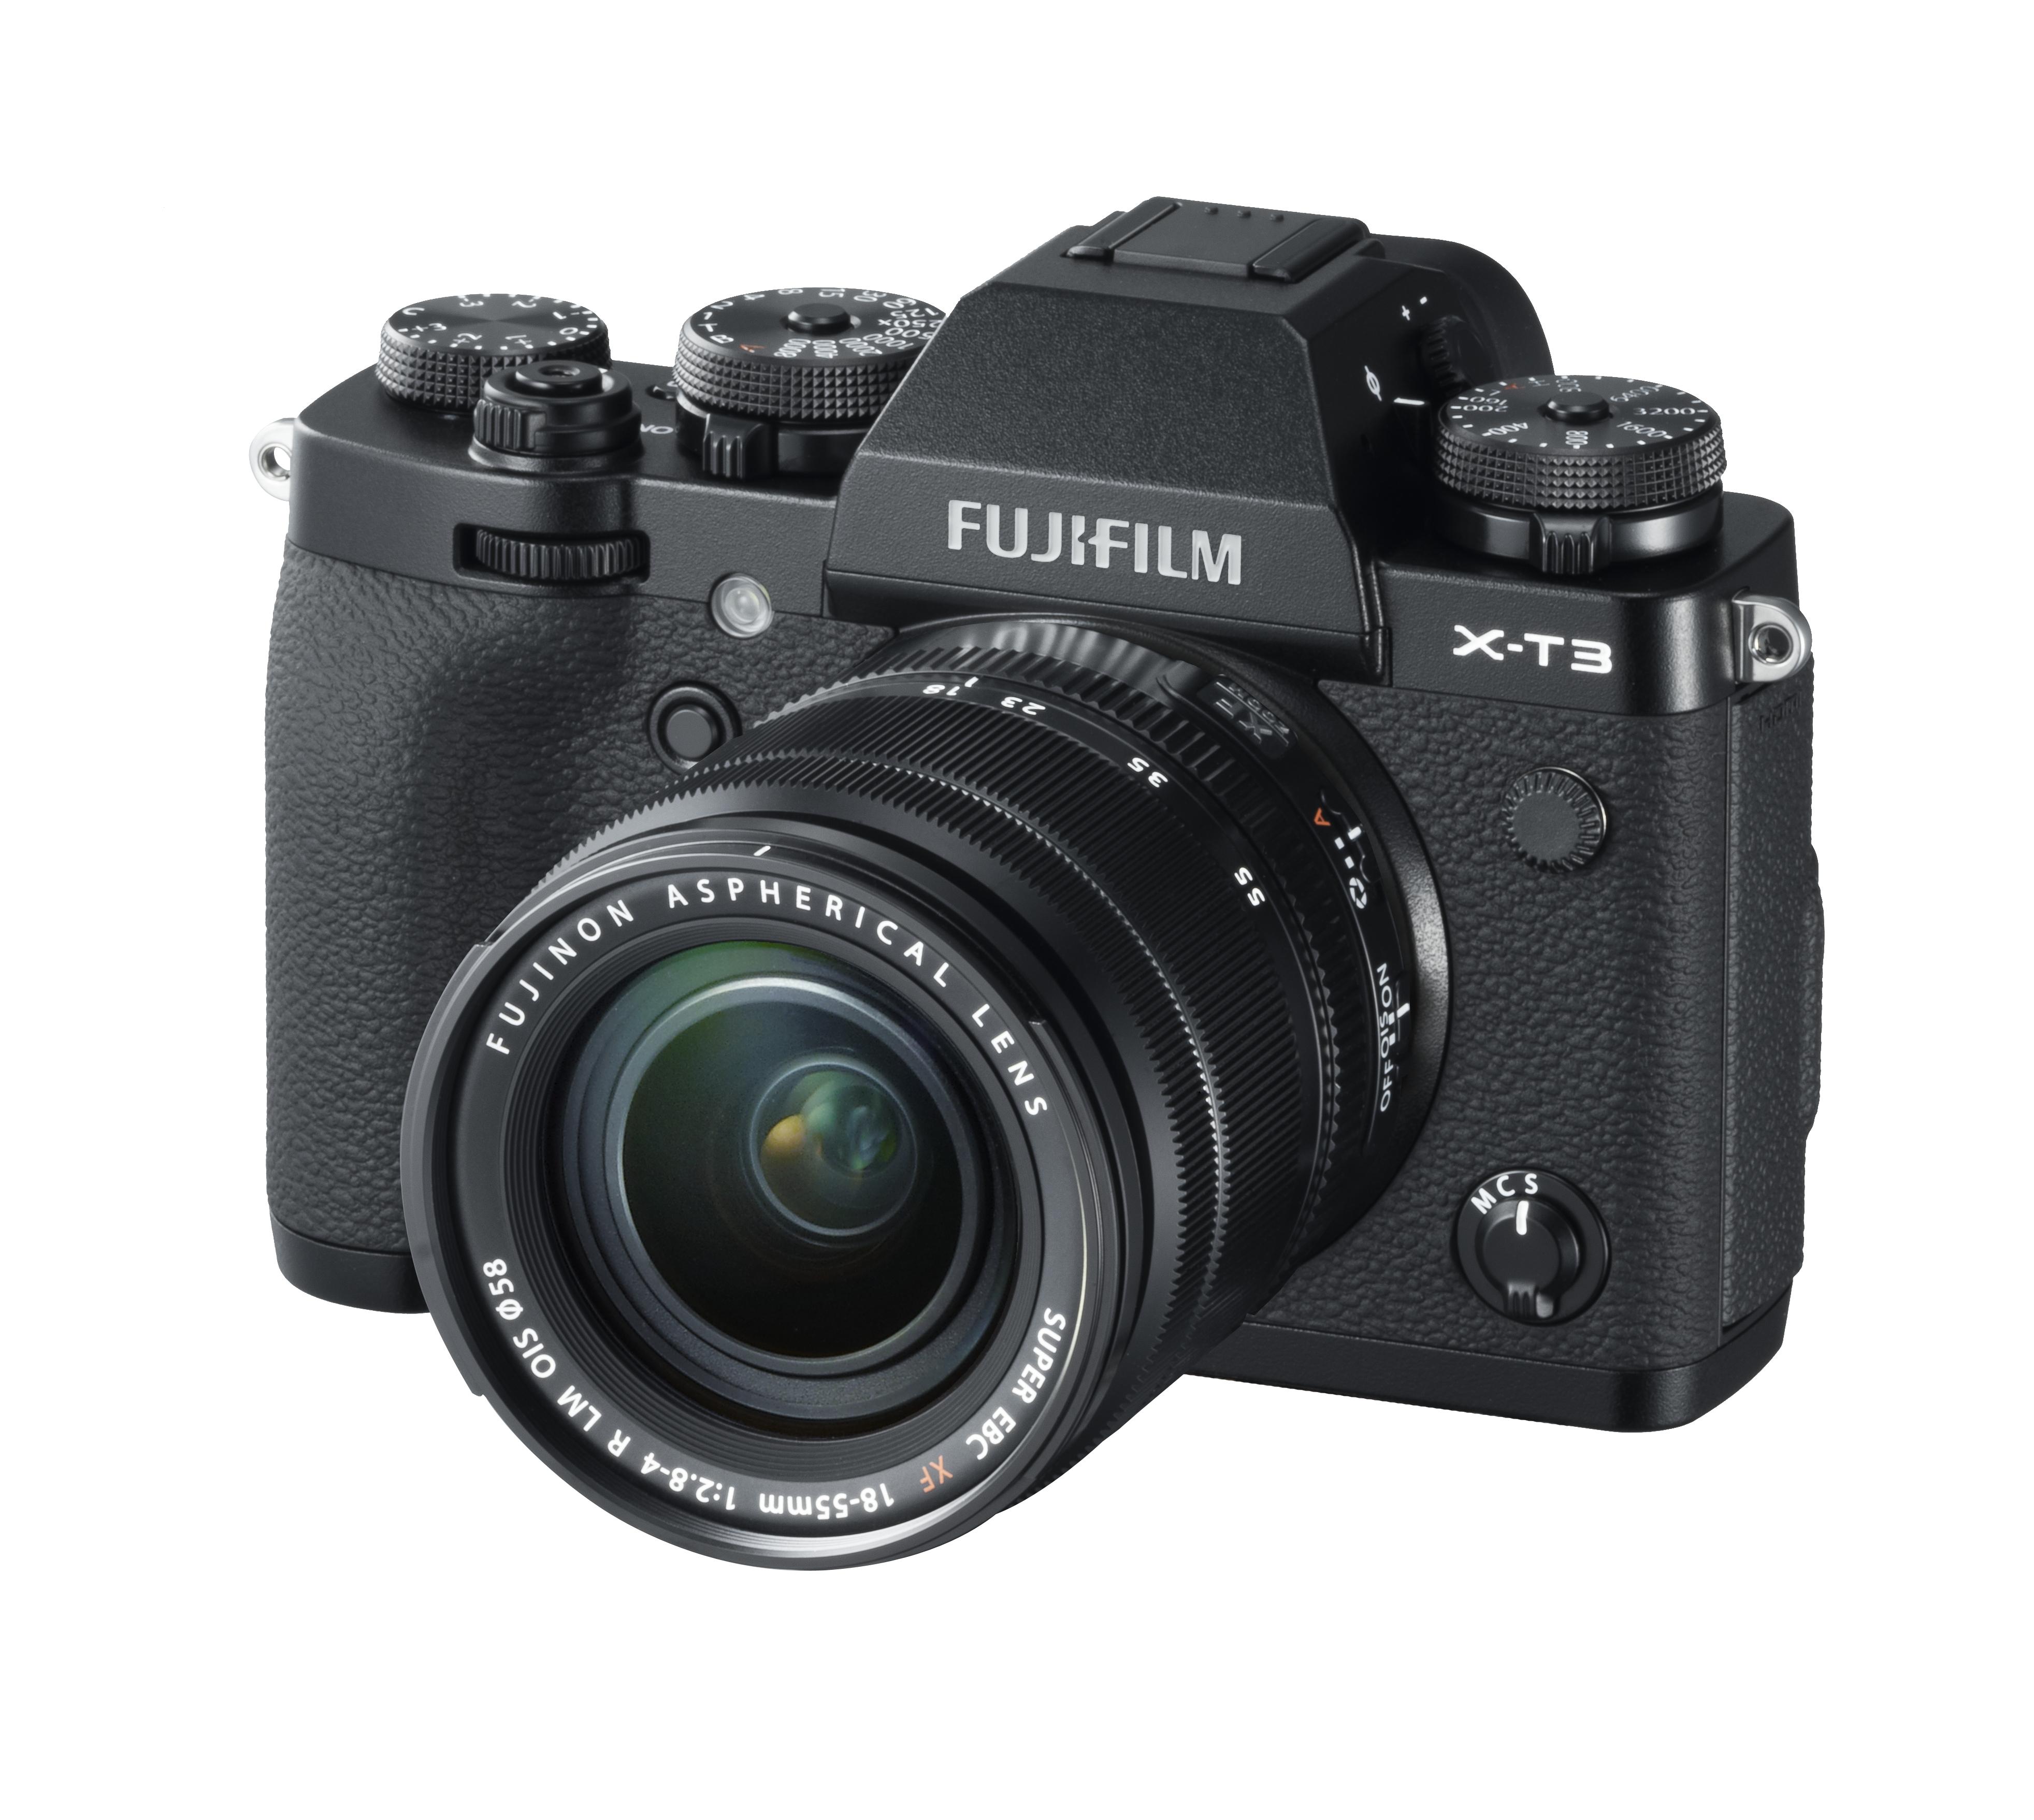 FujiFilm X-T3 with 18-55mm